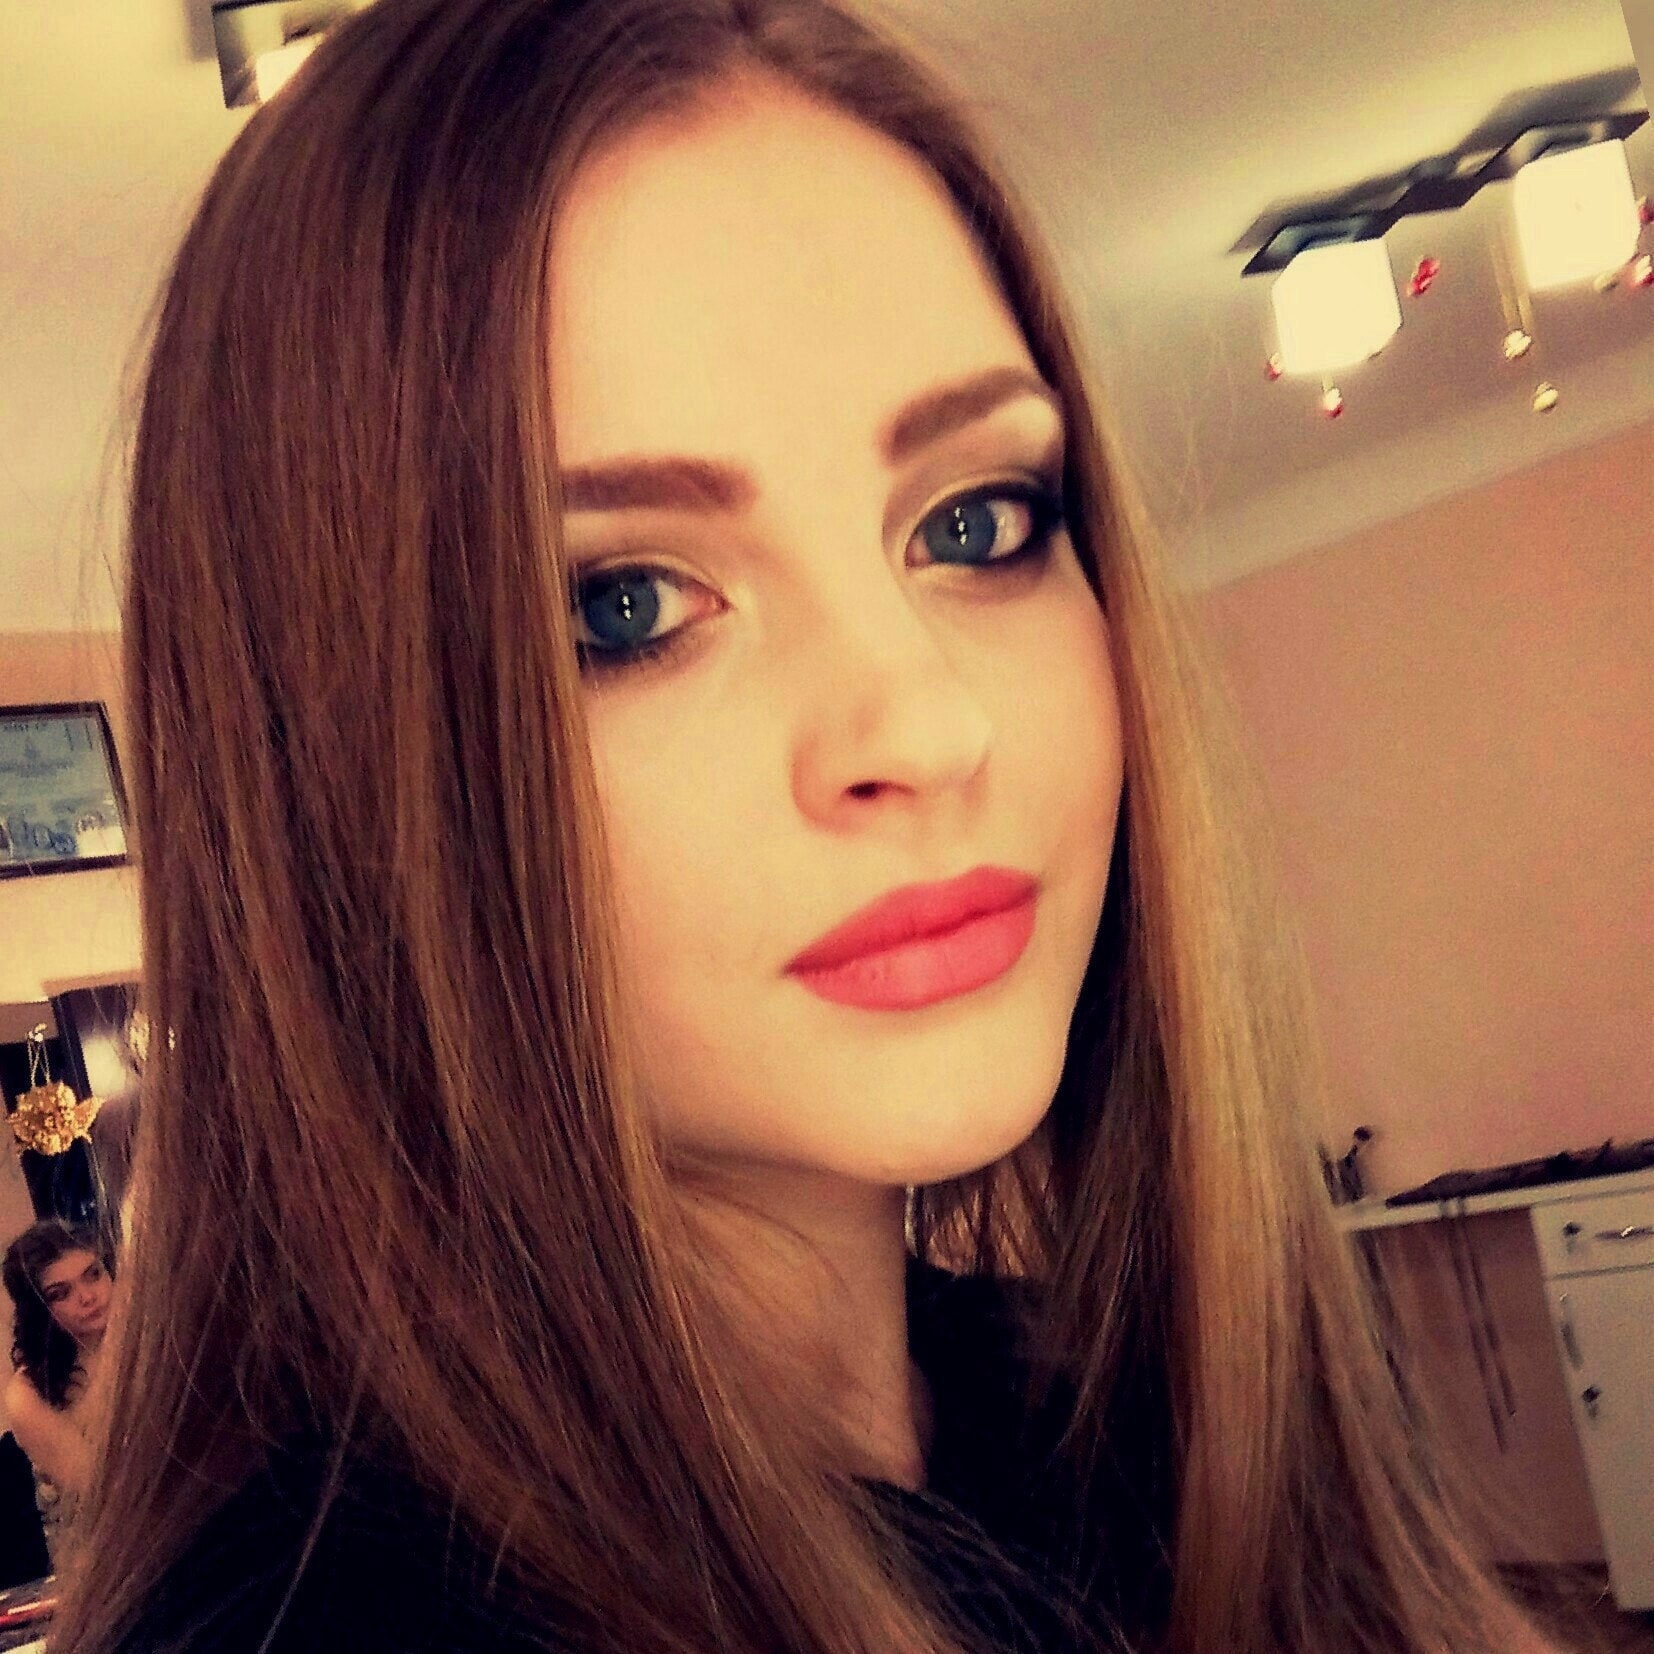 Go to Alina Dyadenko's profile